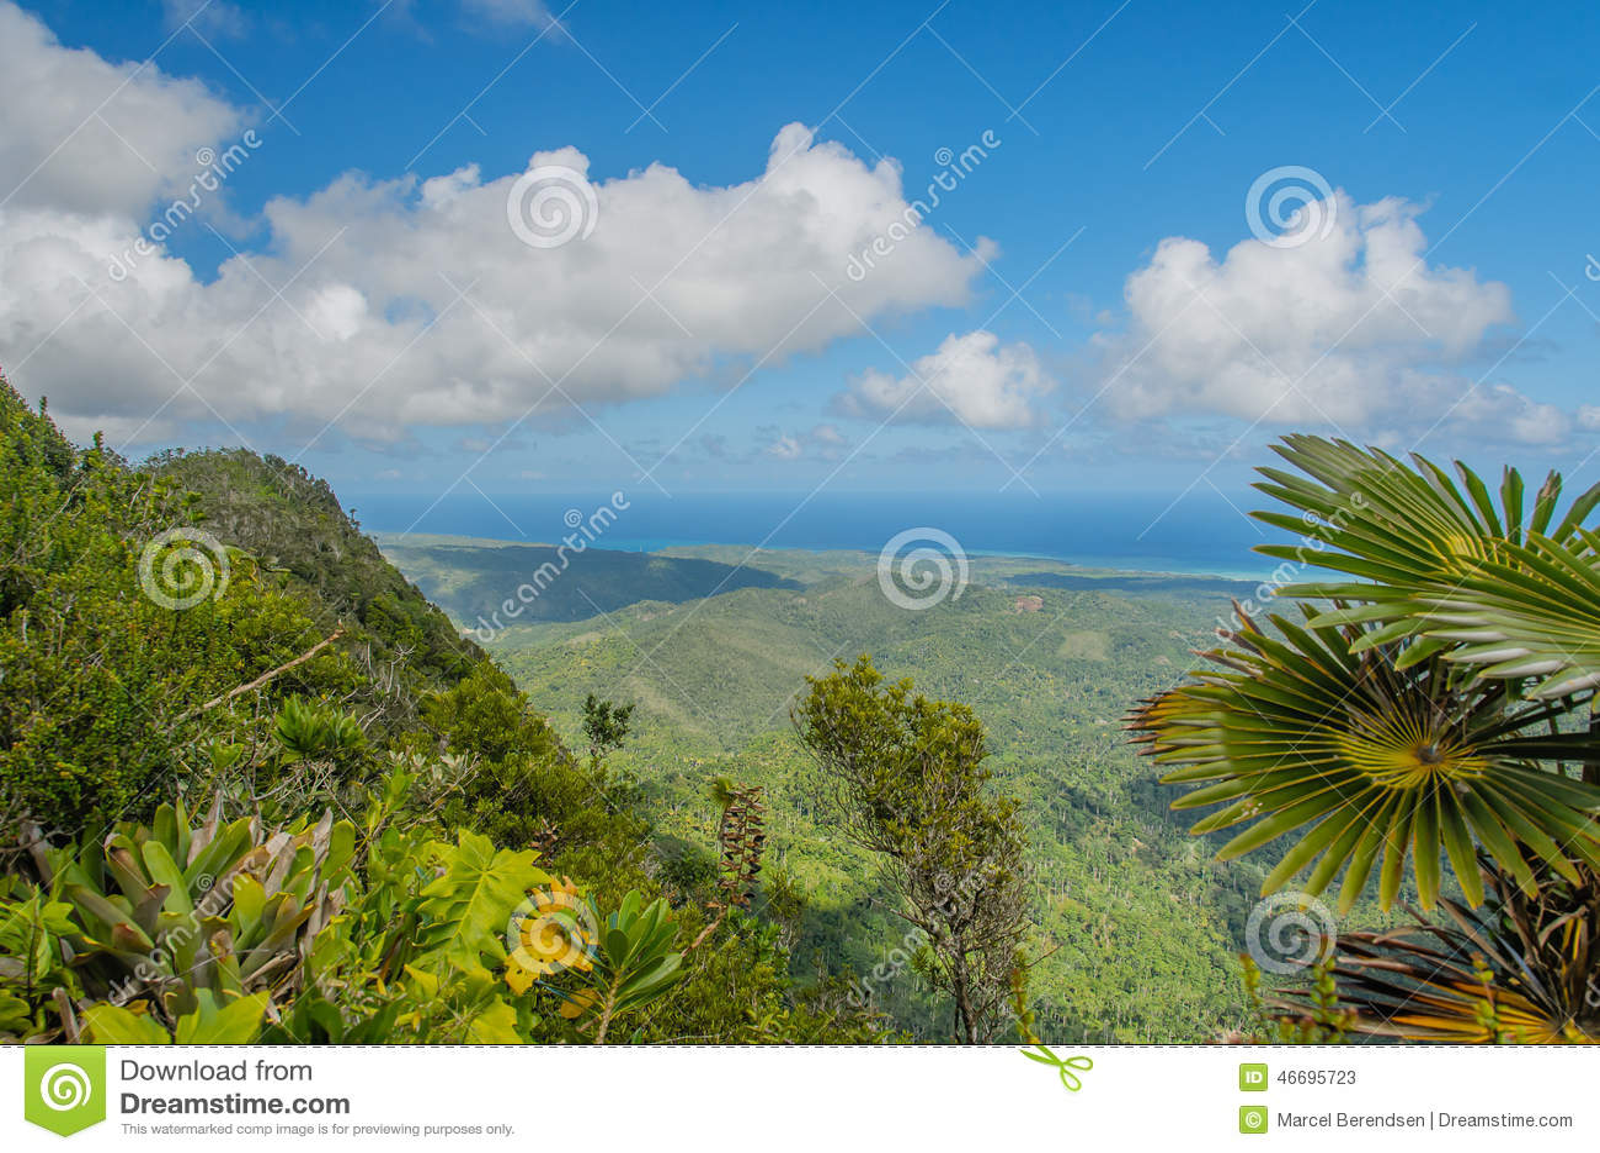 Immagini di Cuba - Baracoa